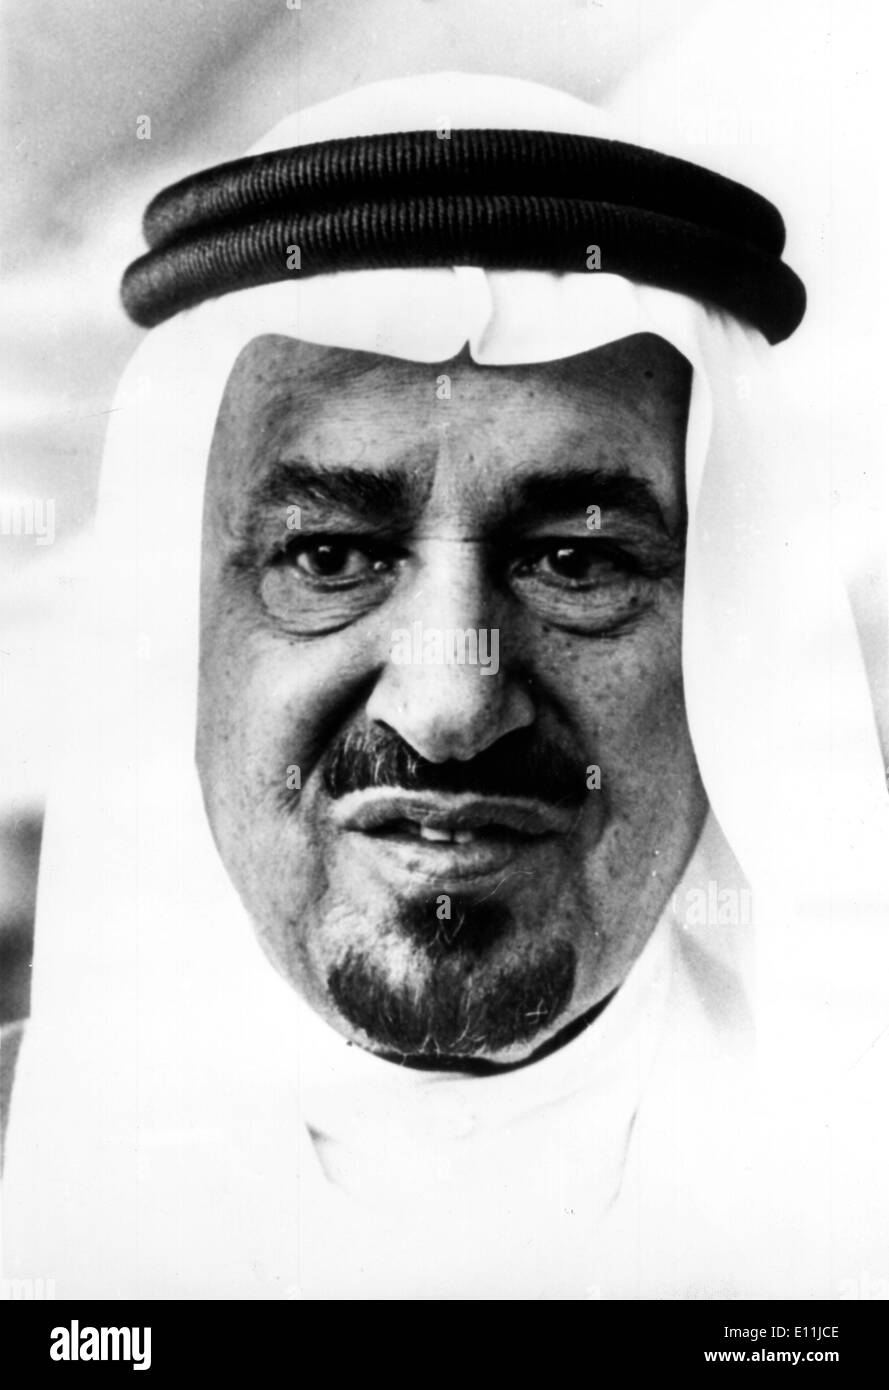 "5508074 (900324) Koenig KHALED von Saudi-Arabien, Ritratto vom Mai 1978 in Bruessel. ""Nutzung nur gegen Honorar, Beleg, Immagini Stock"